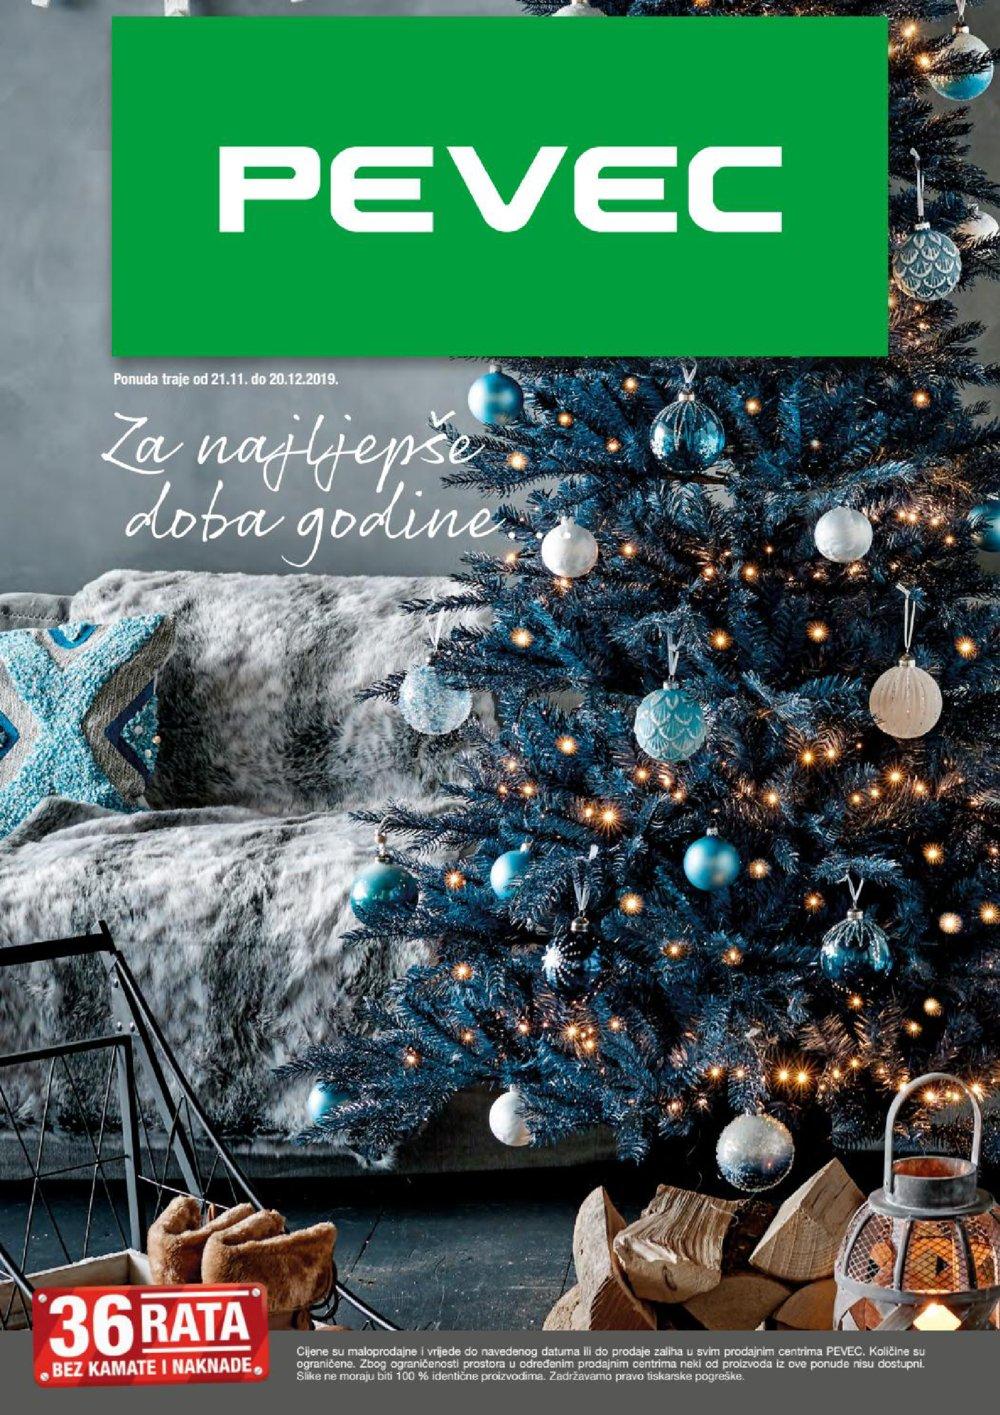 Pevec katalog Božić 21.11.-20.12.2019.